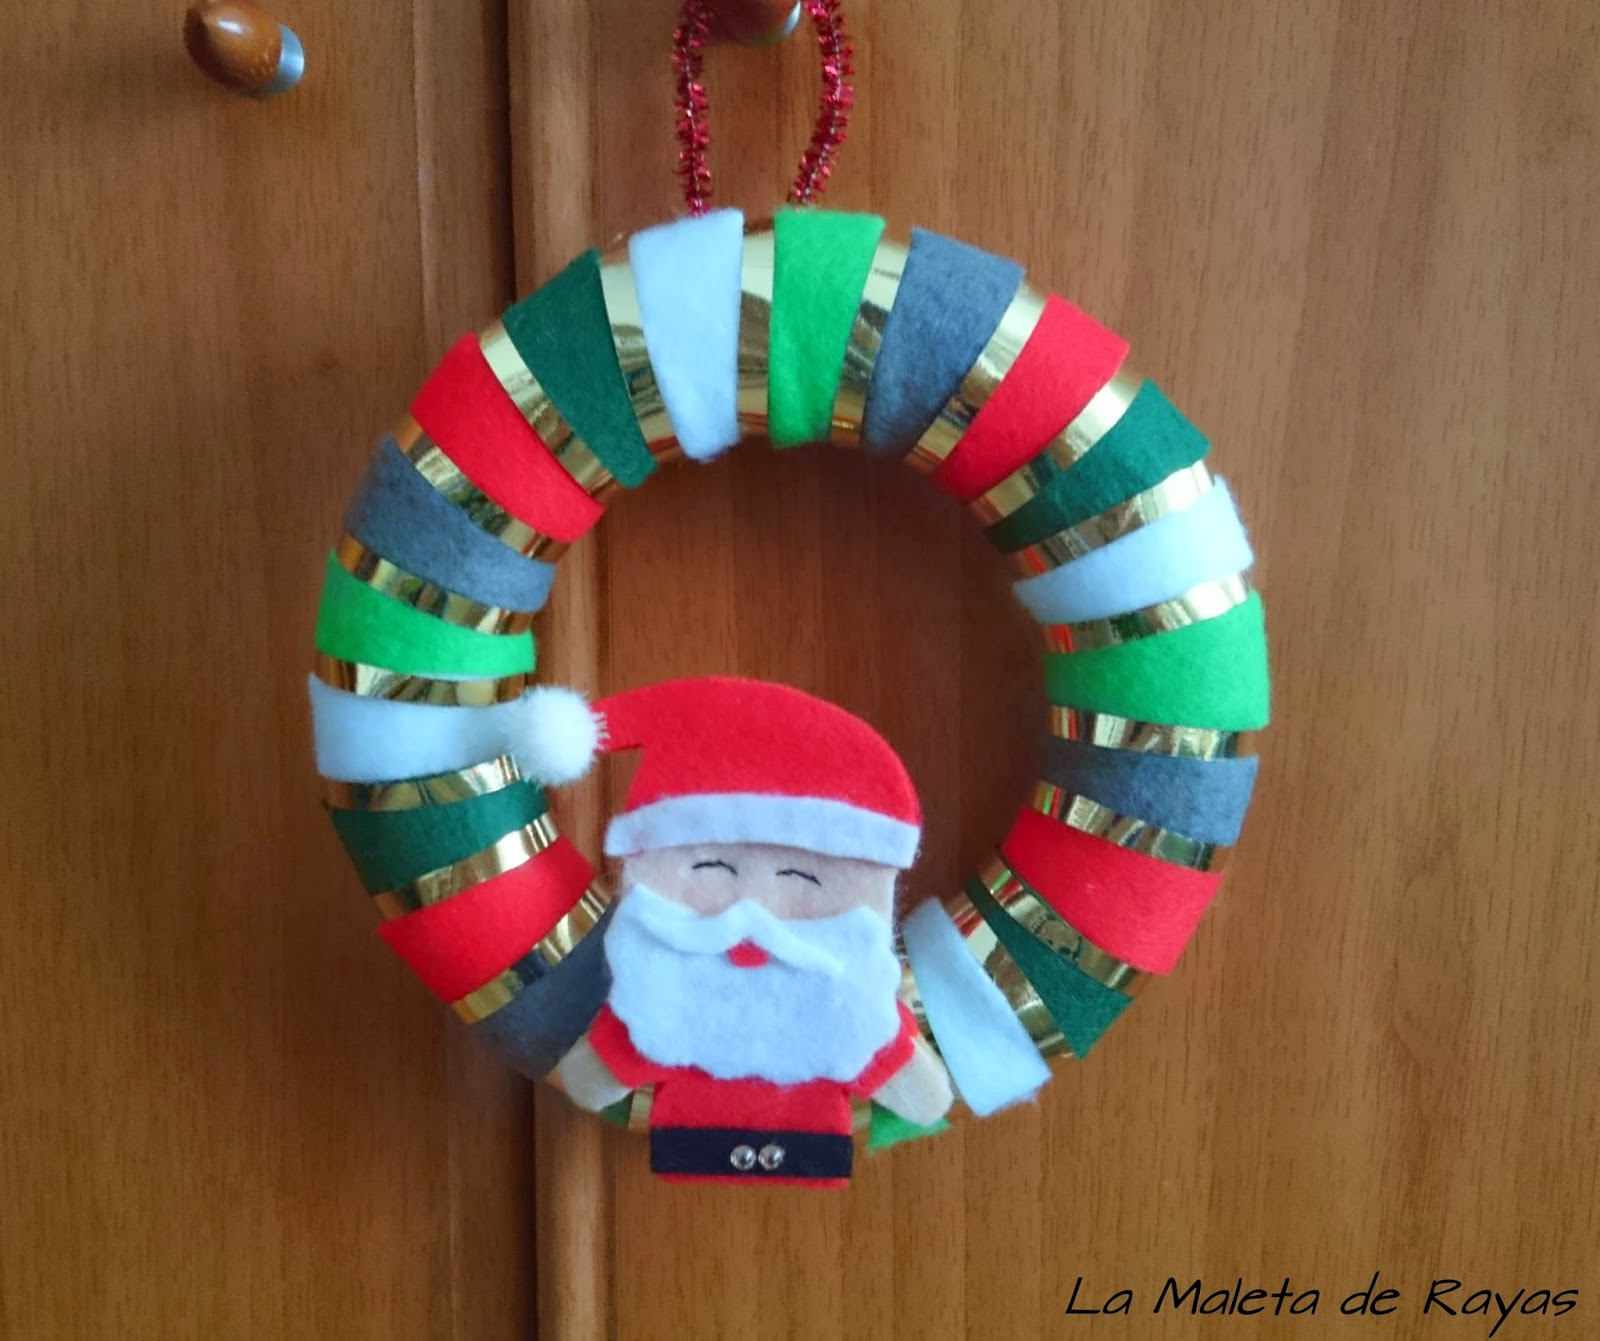 Decorar puerta navidena aprender manualidades es for Materiales para manualidades navidenas